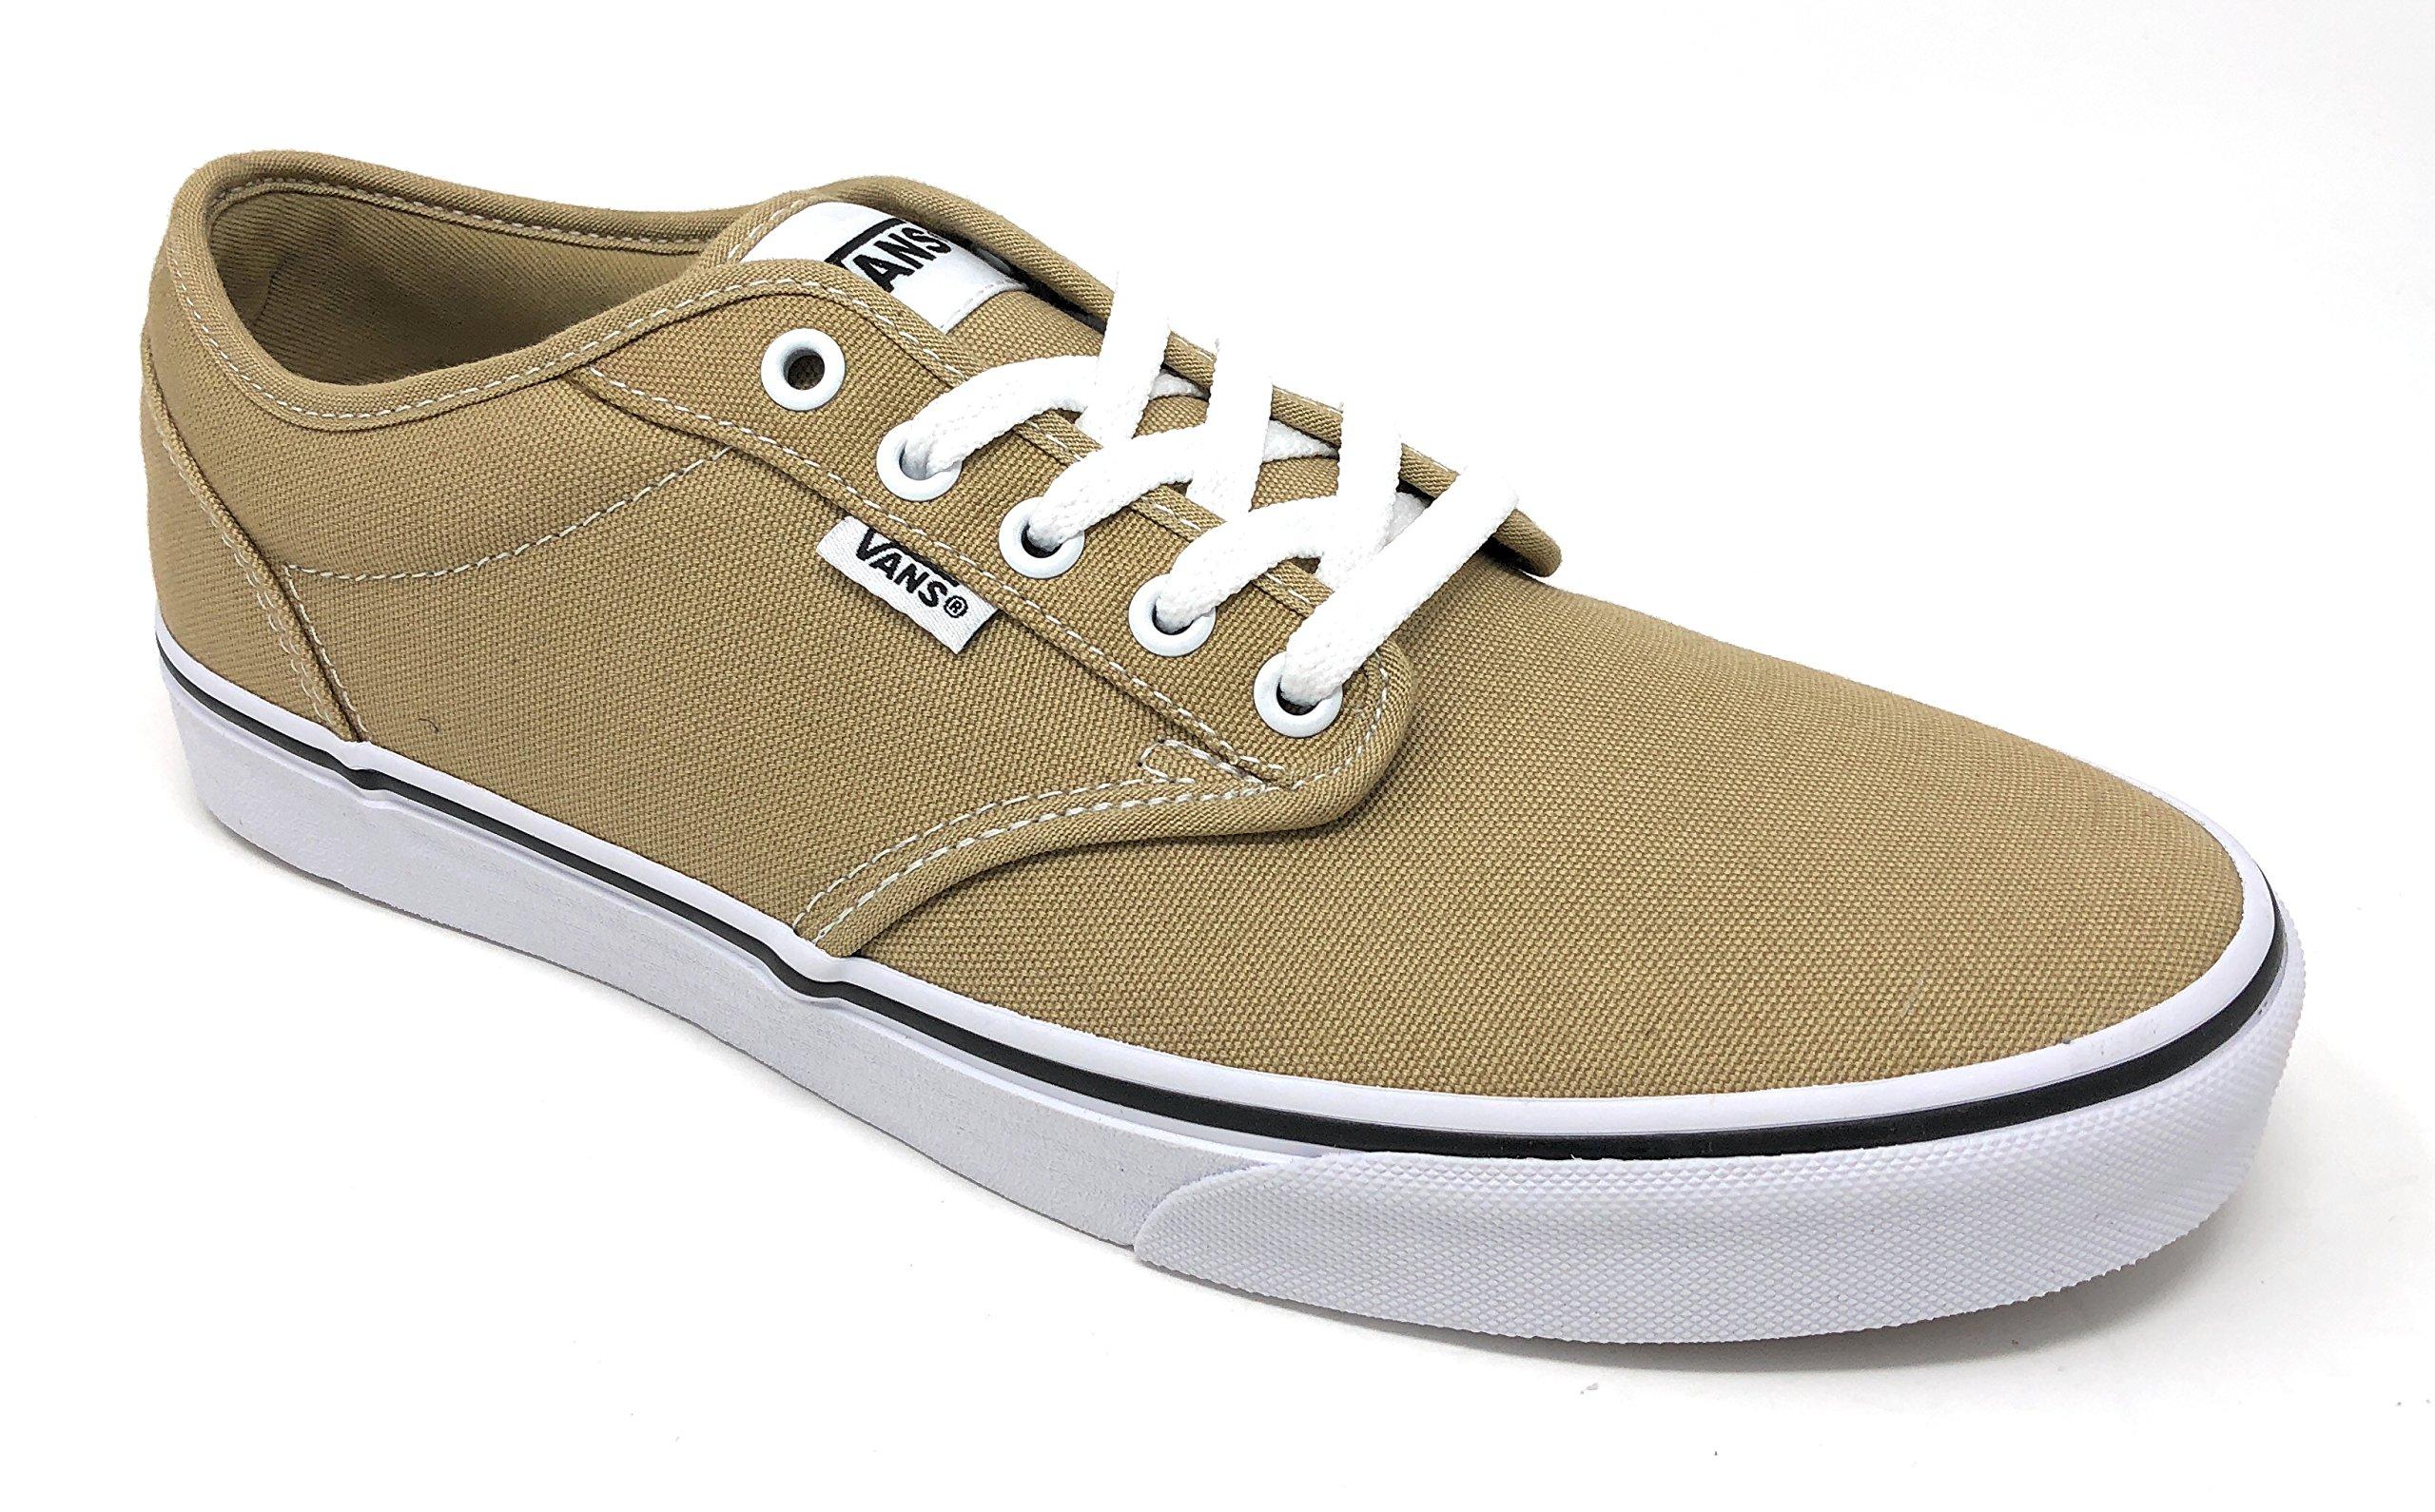 7b4c9e7c59 Galleon - Vans Men s Atwood (Canvas) Cornstalk White Skate Shoe 8 Men US